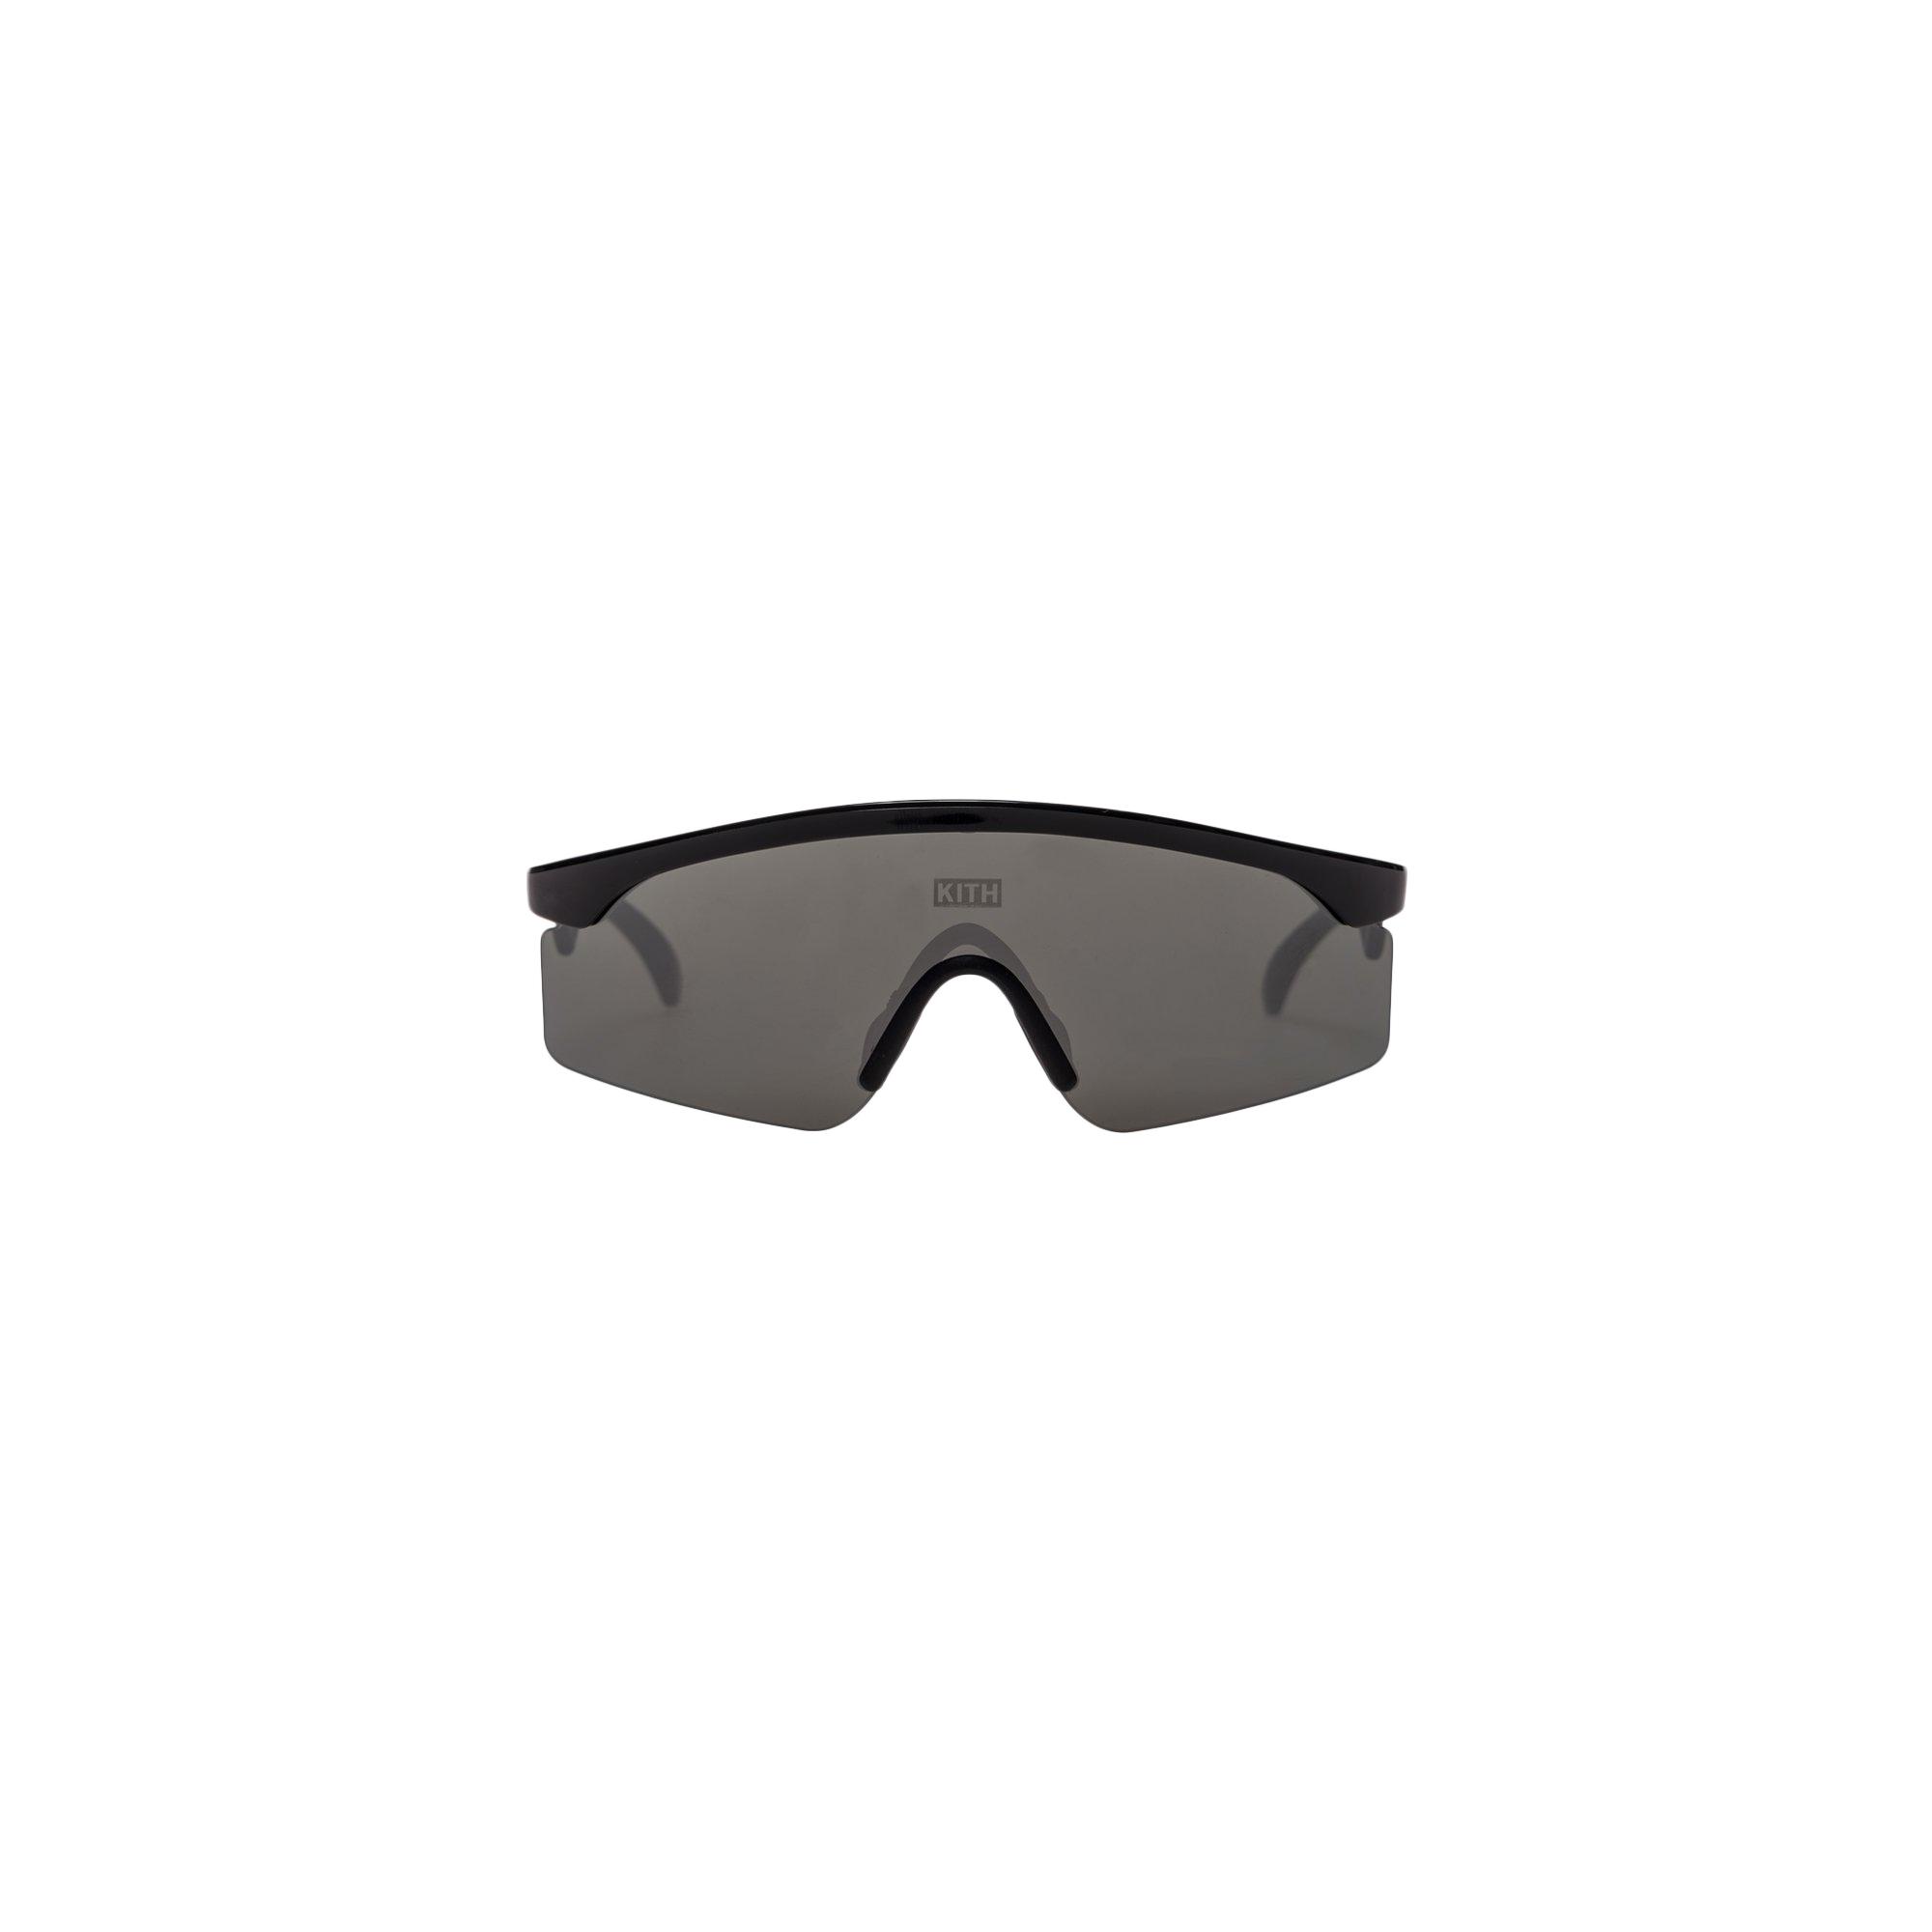 3ed99dfb2026 ... wholesale kith x oakley razorblade sunglasses black d30b6 53ba9